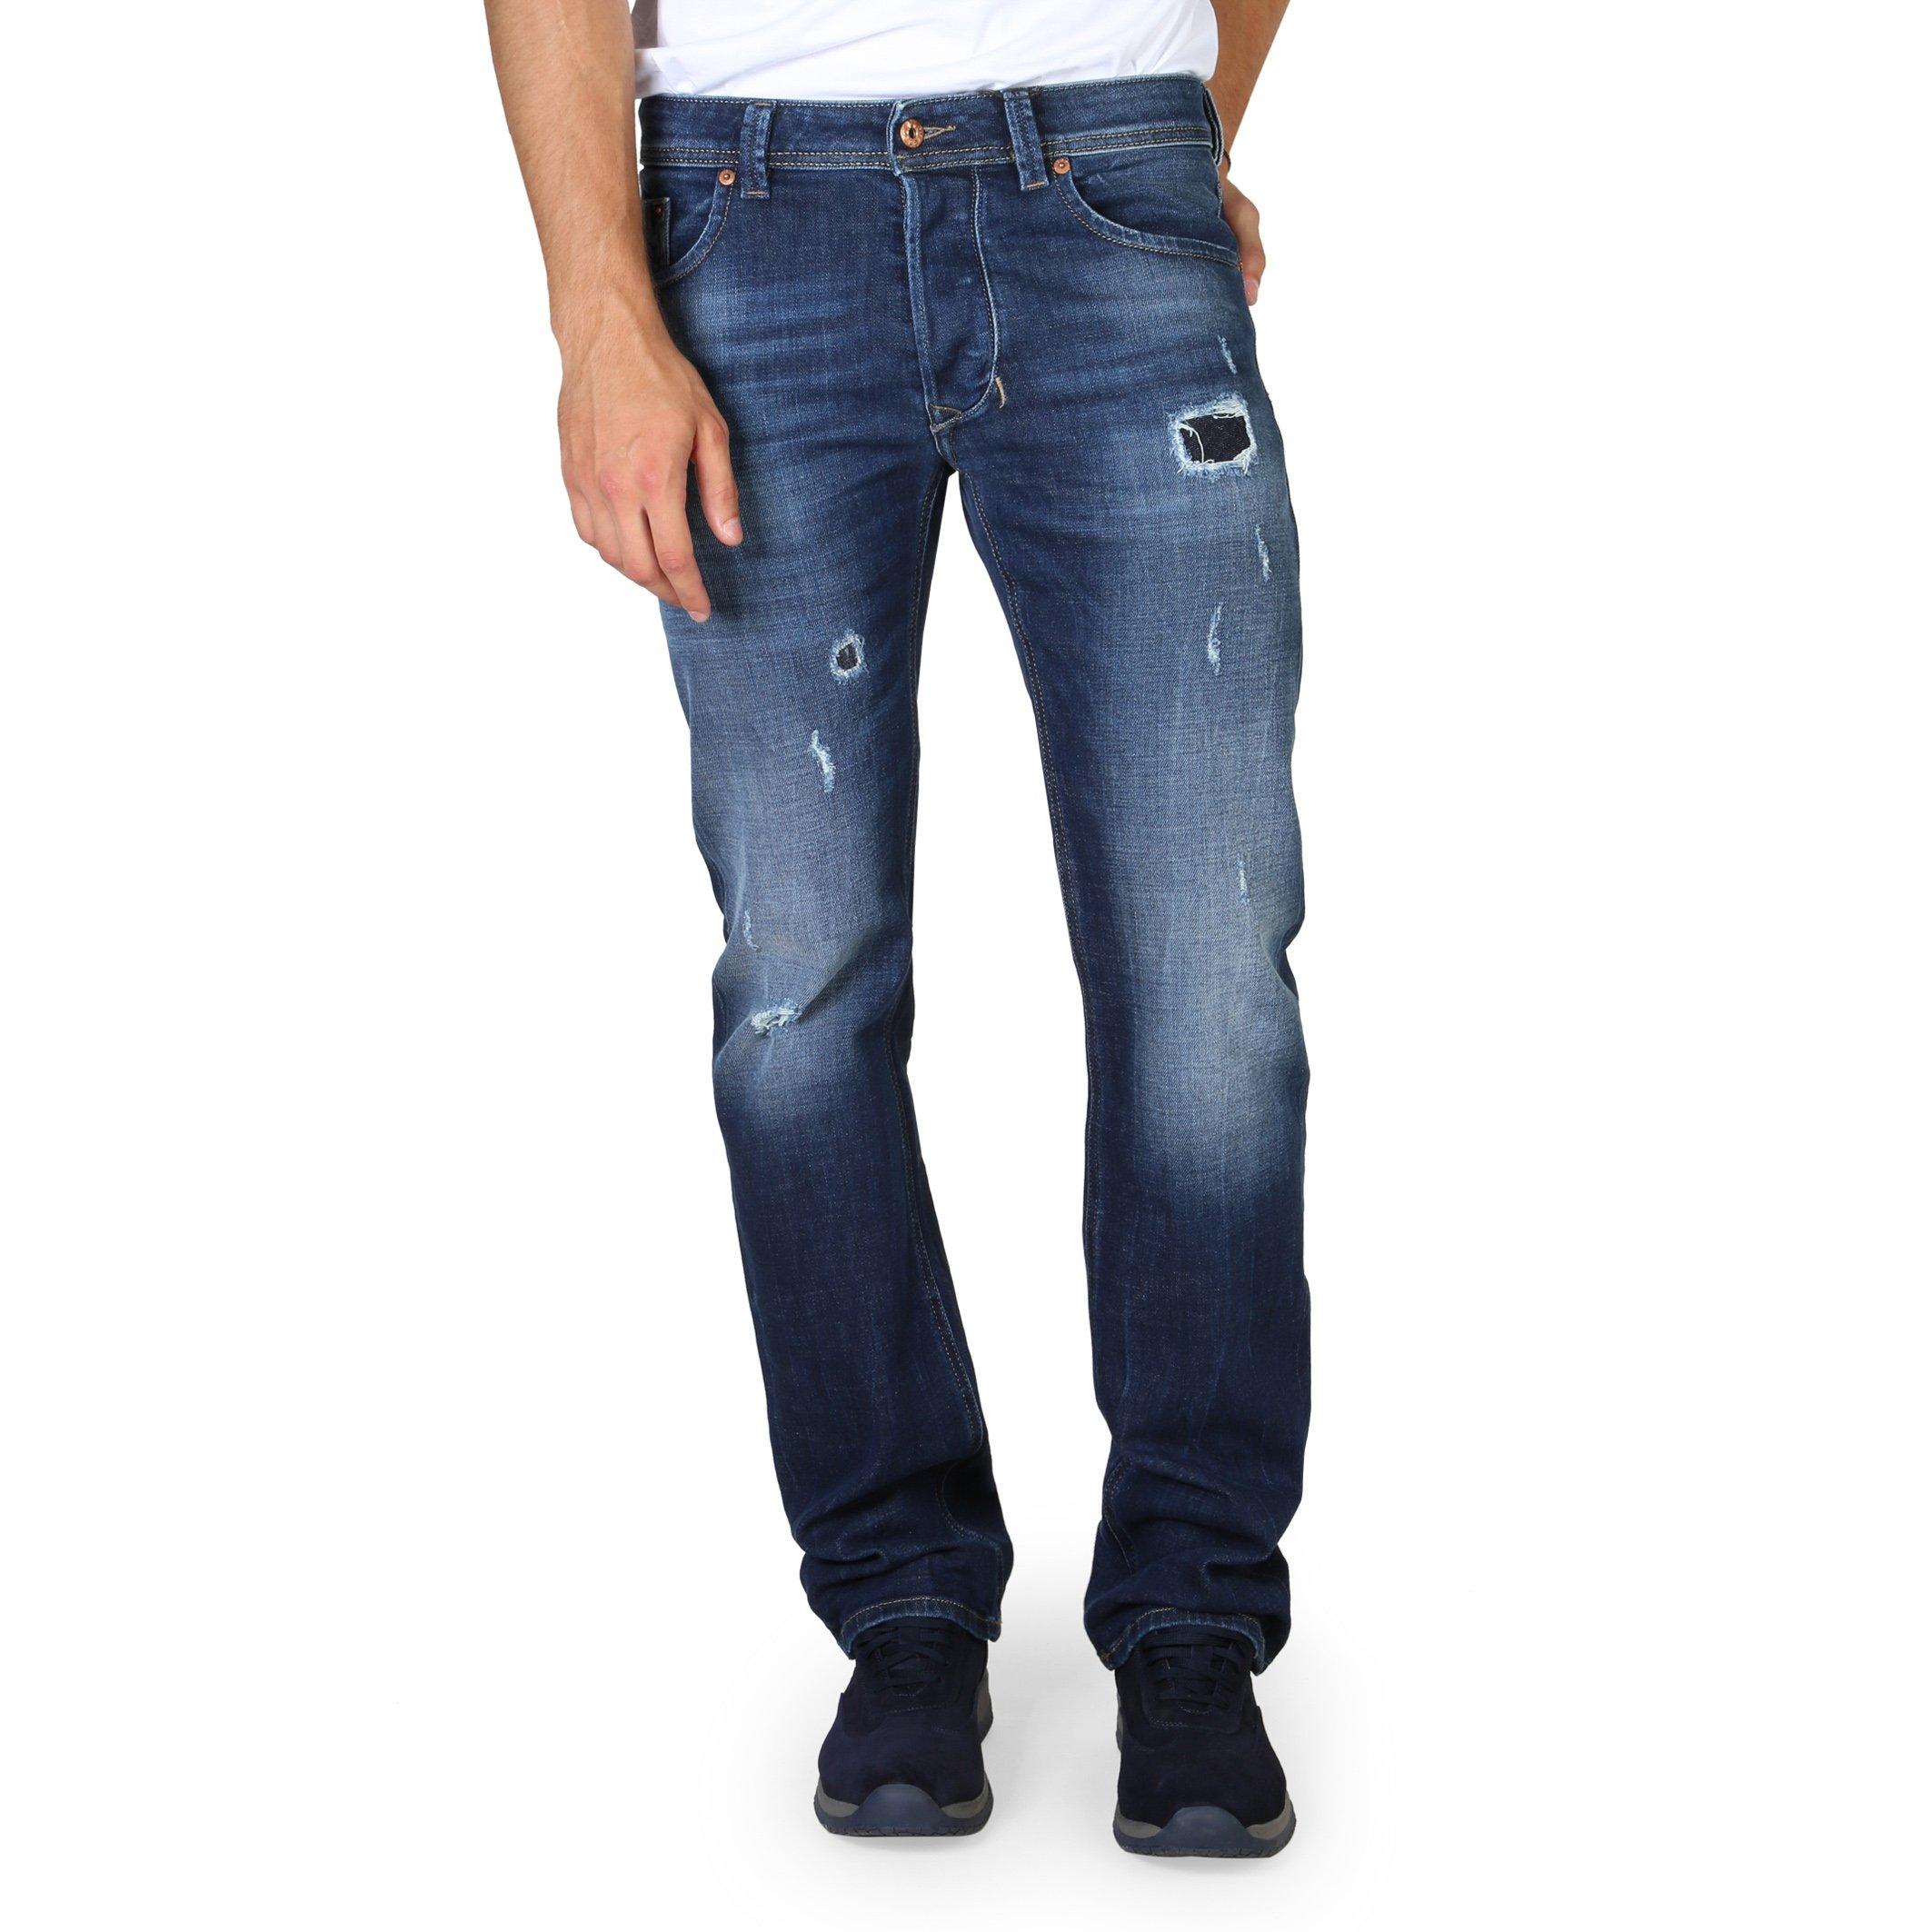 Diesel Men's Jeans Blue LARKEE_L32 - blue-3 29